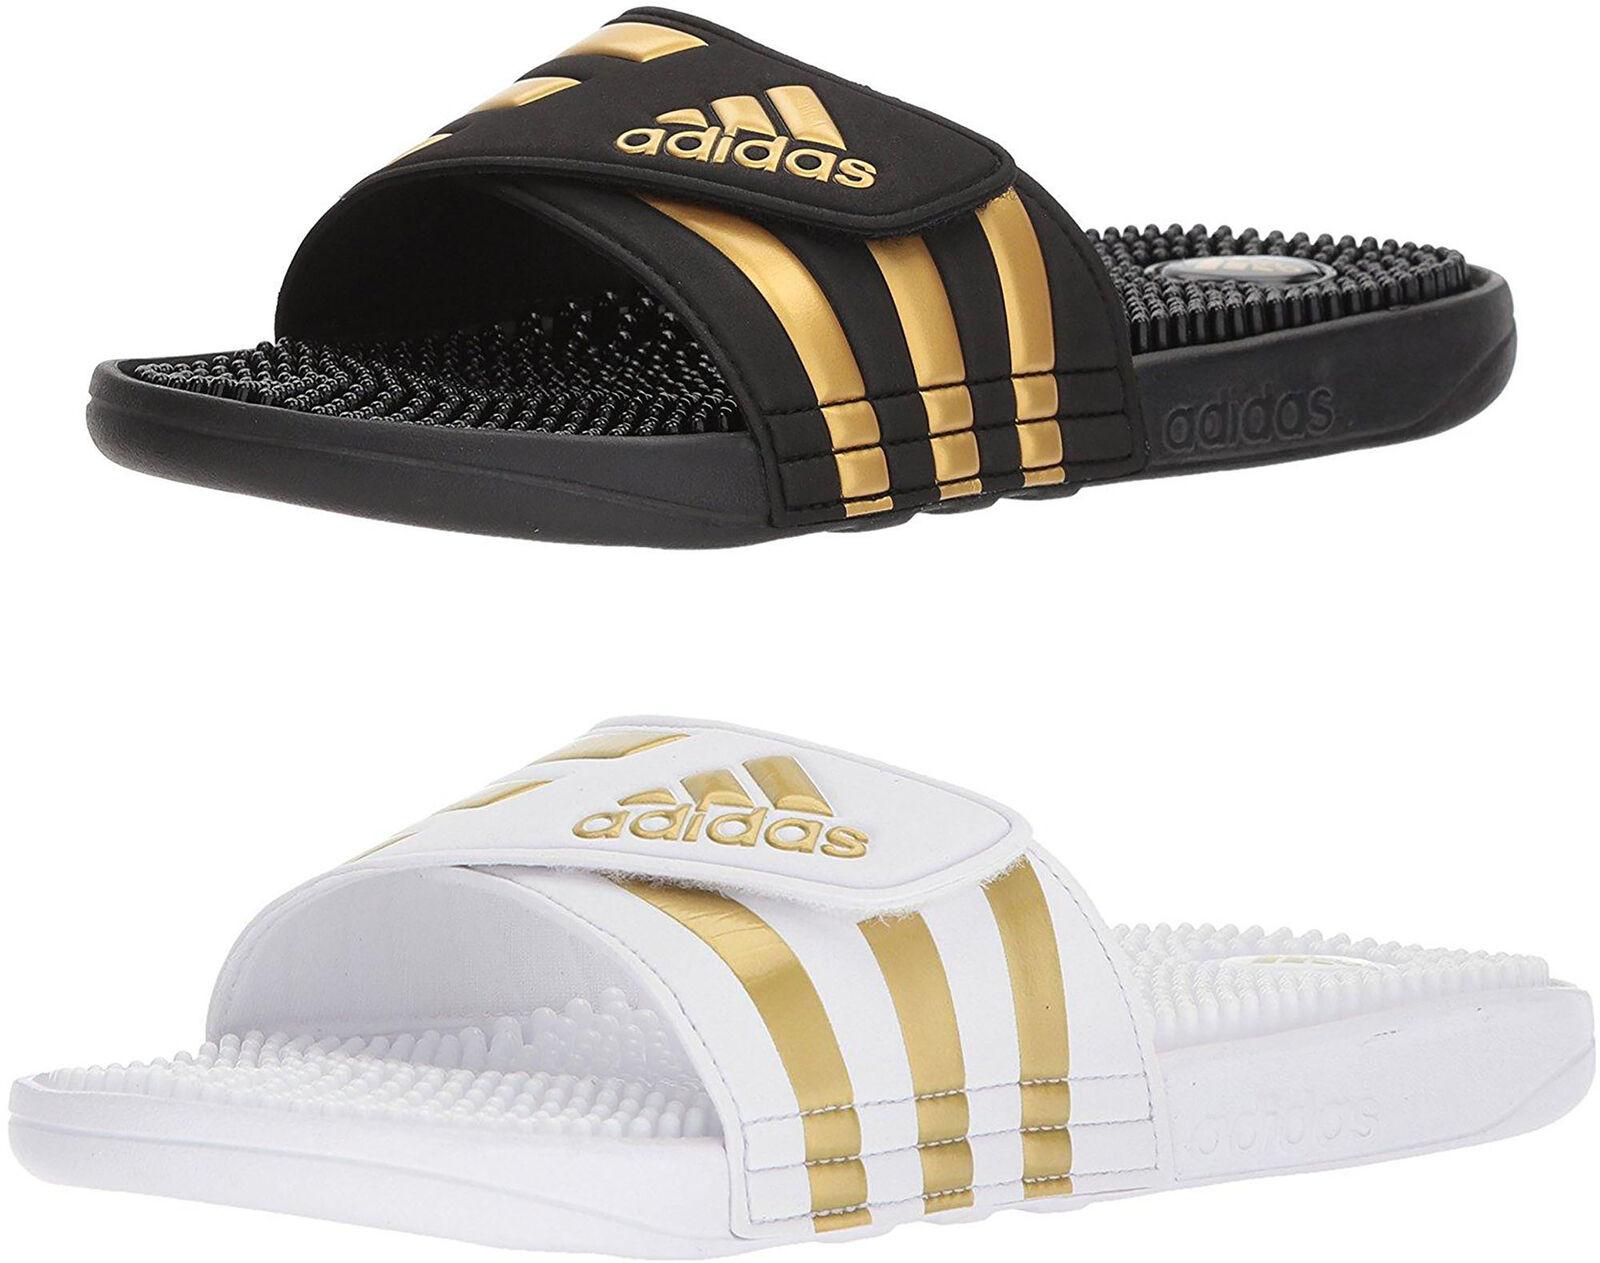 quality design 967ff 79231 adidas Mens Adissage Sport Sandal Slides, 2 Colors